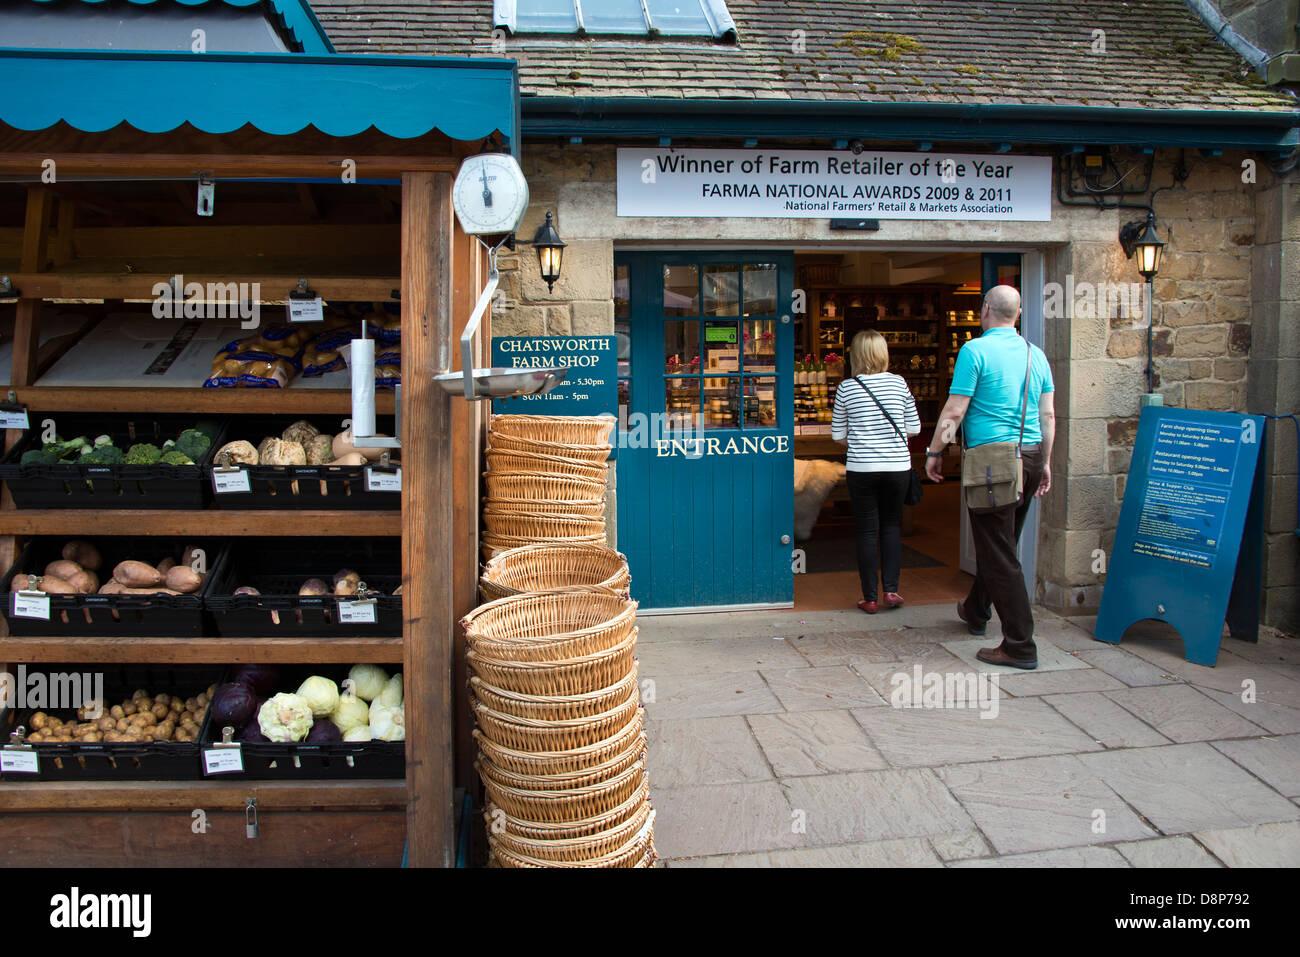 Chatsworth Farm Shop entrance - Stock Image